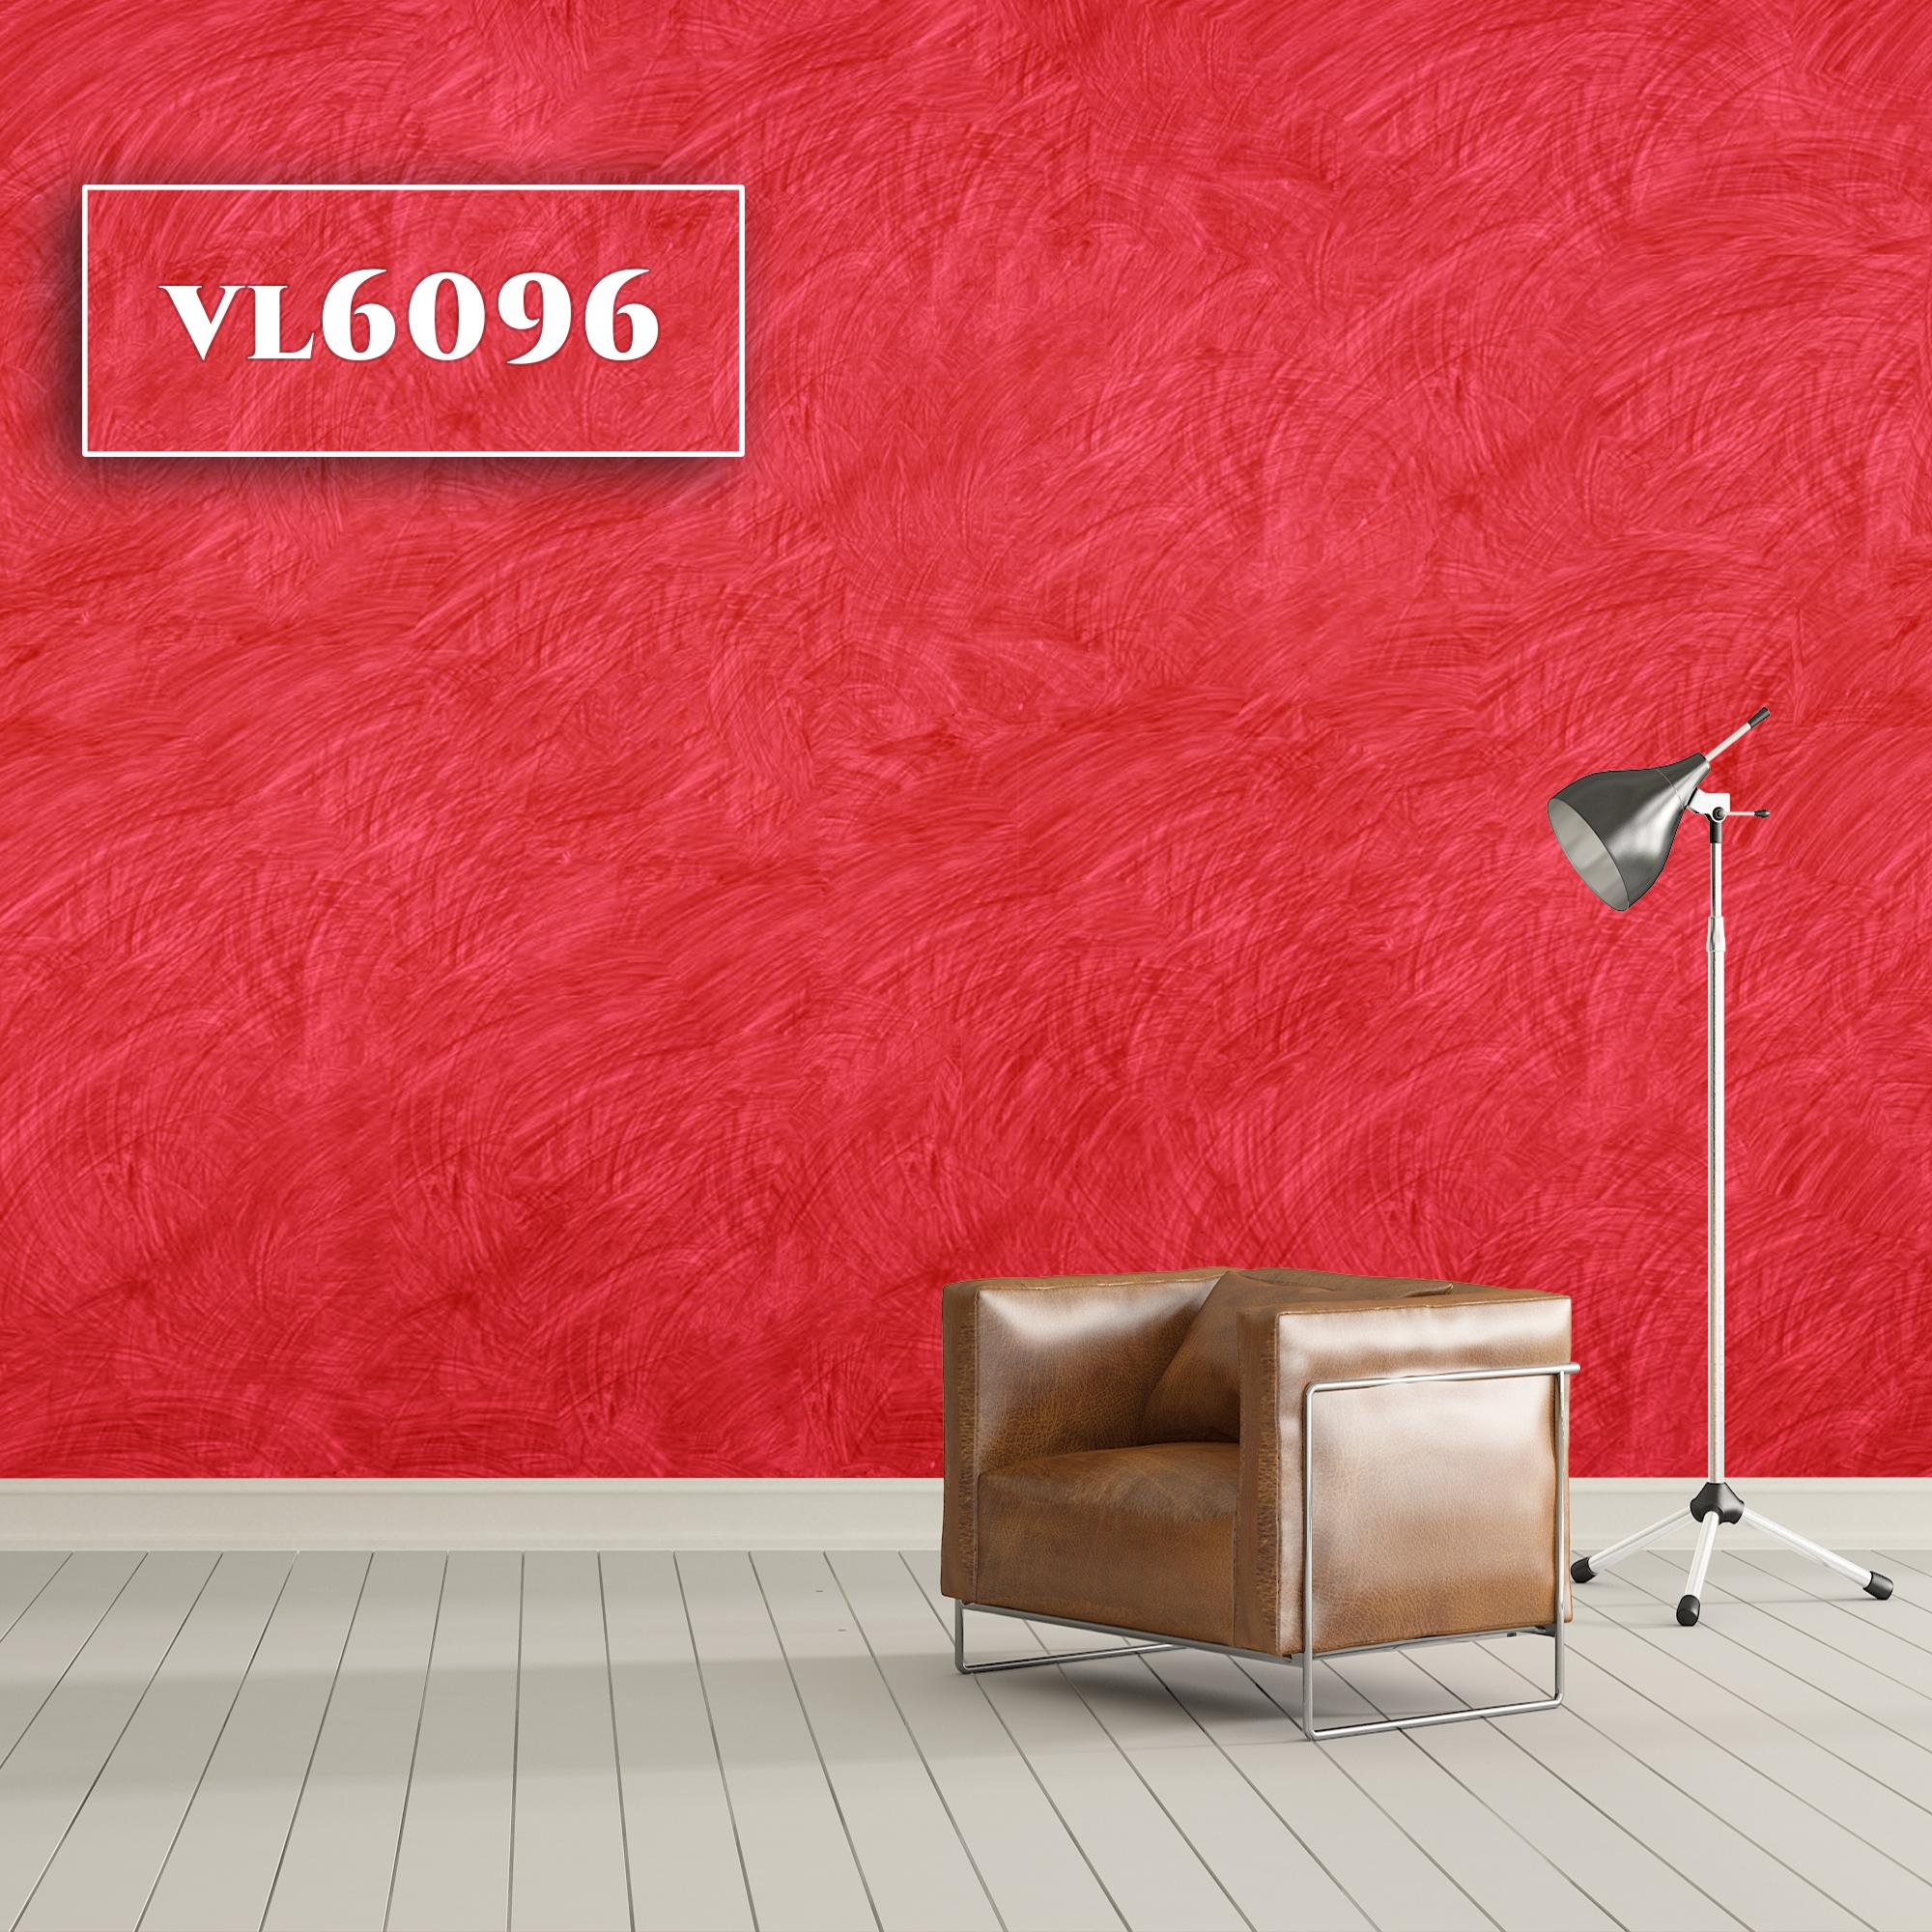 VL6096